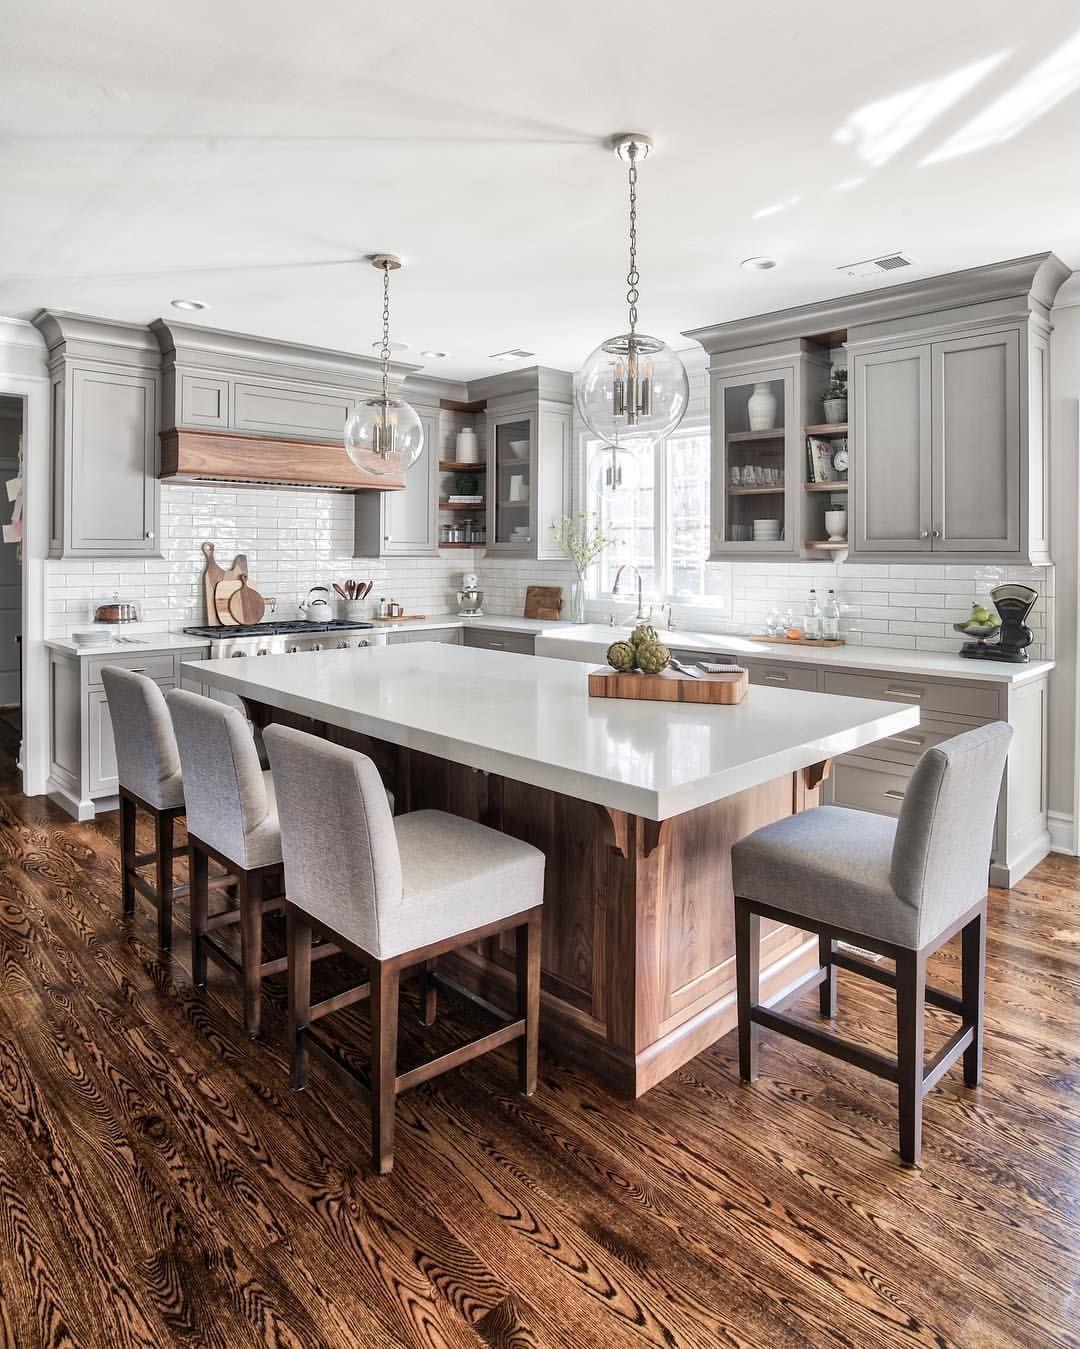 6 Unbelievable Ideas Old Kitchen Remodel Tips Kitchen Remodel Black